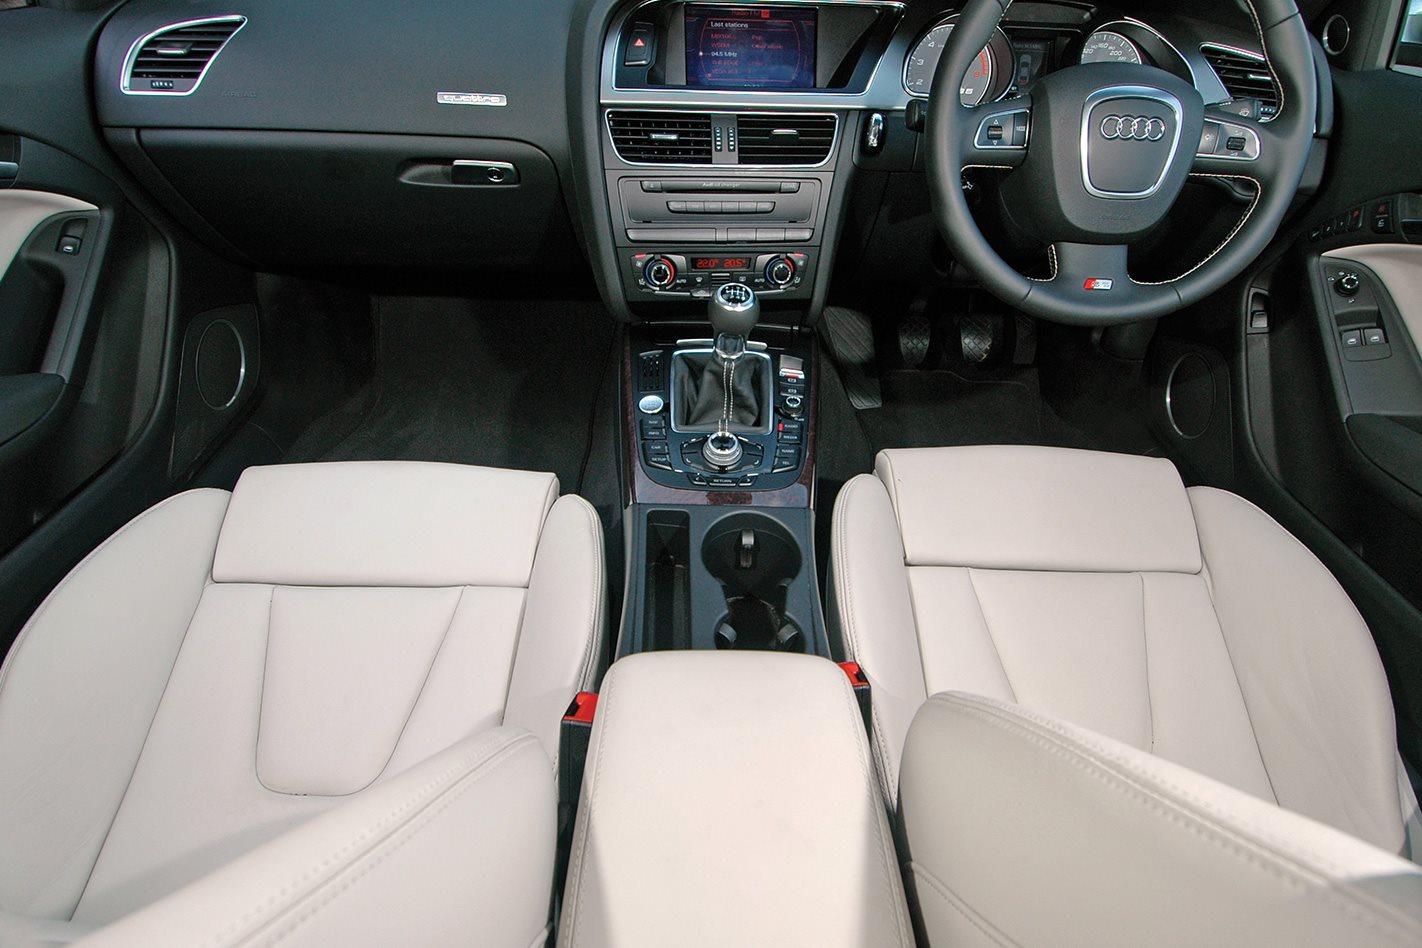 2008 Audi S5 S-Tronic cabin